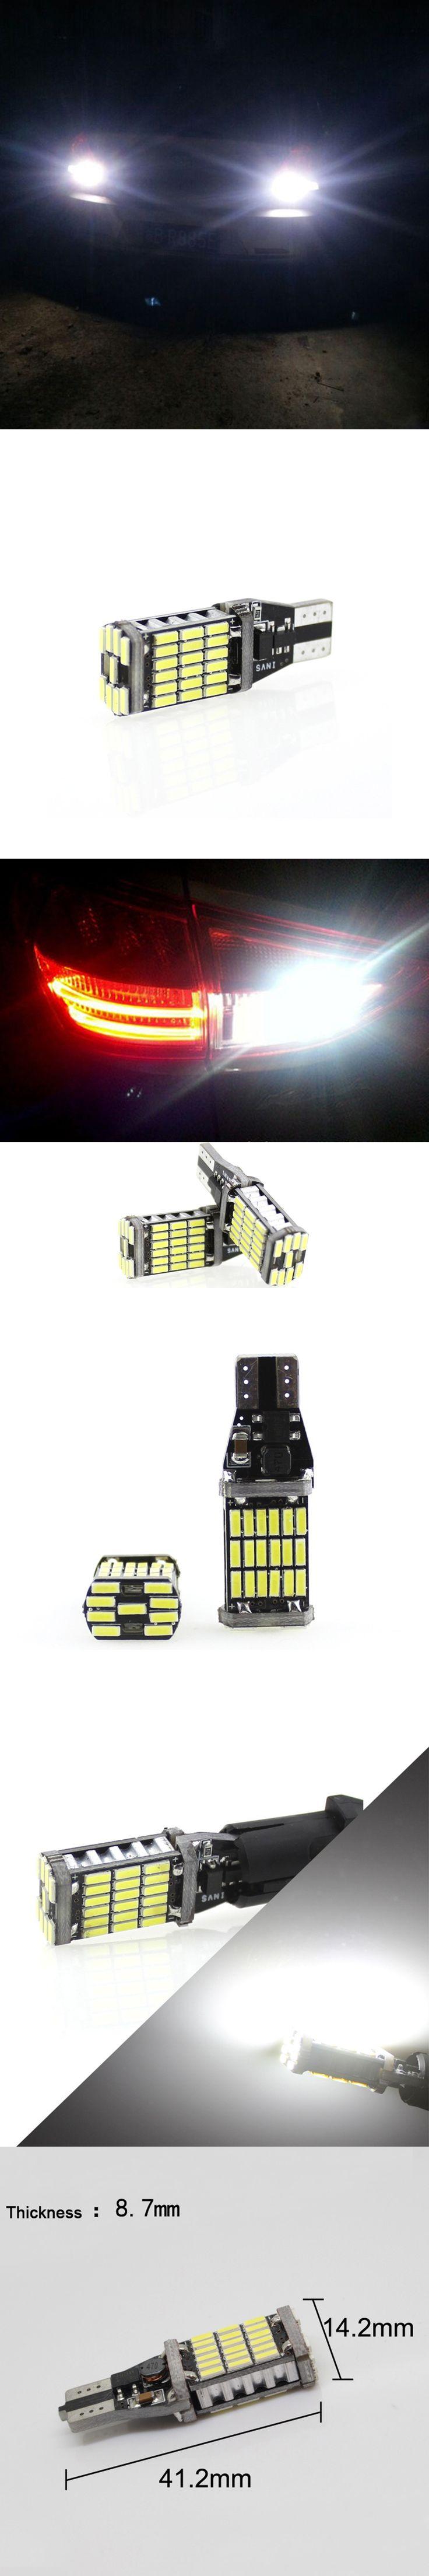 2pcs Canbus T15 921 15W 4014 SMD W16W 45 LED Auto Car Backup Light Reverse Lamp Bulb For Nissan Juke 2011 2012 2013 2014 2015